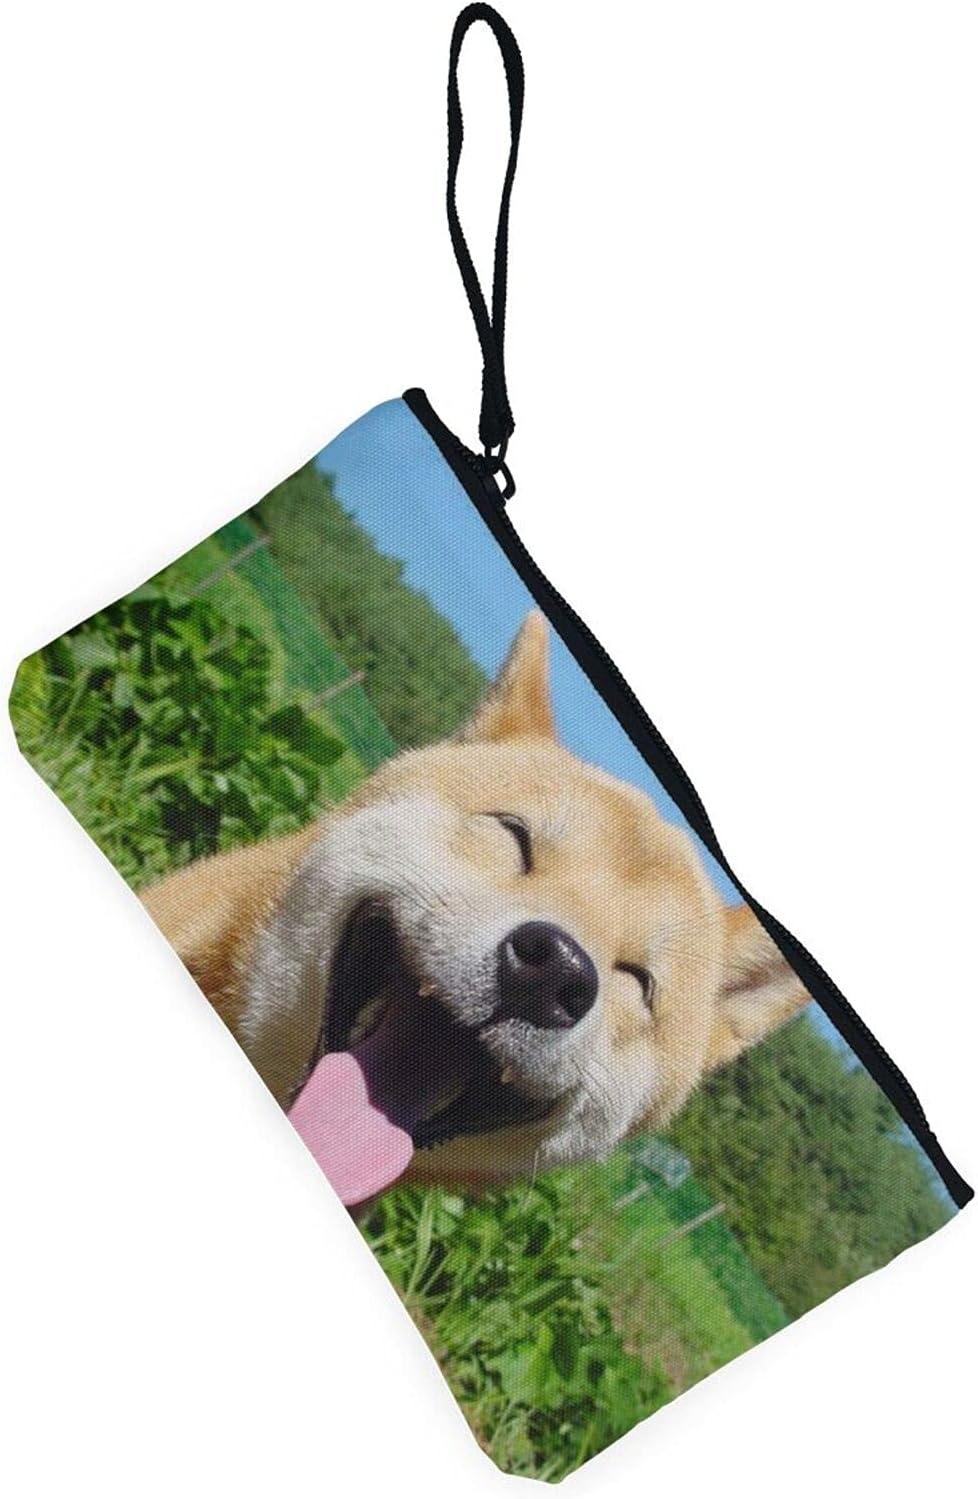 AORRUAM Shiba Inu smile Canvas Coin Purse,Canvas Zipper Pencil Cases,Canvas Change Purse Pouch Mini Wallet Coin Bag